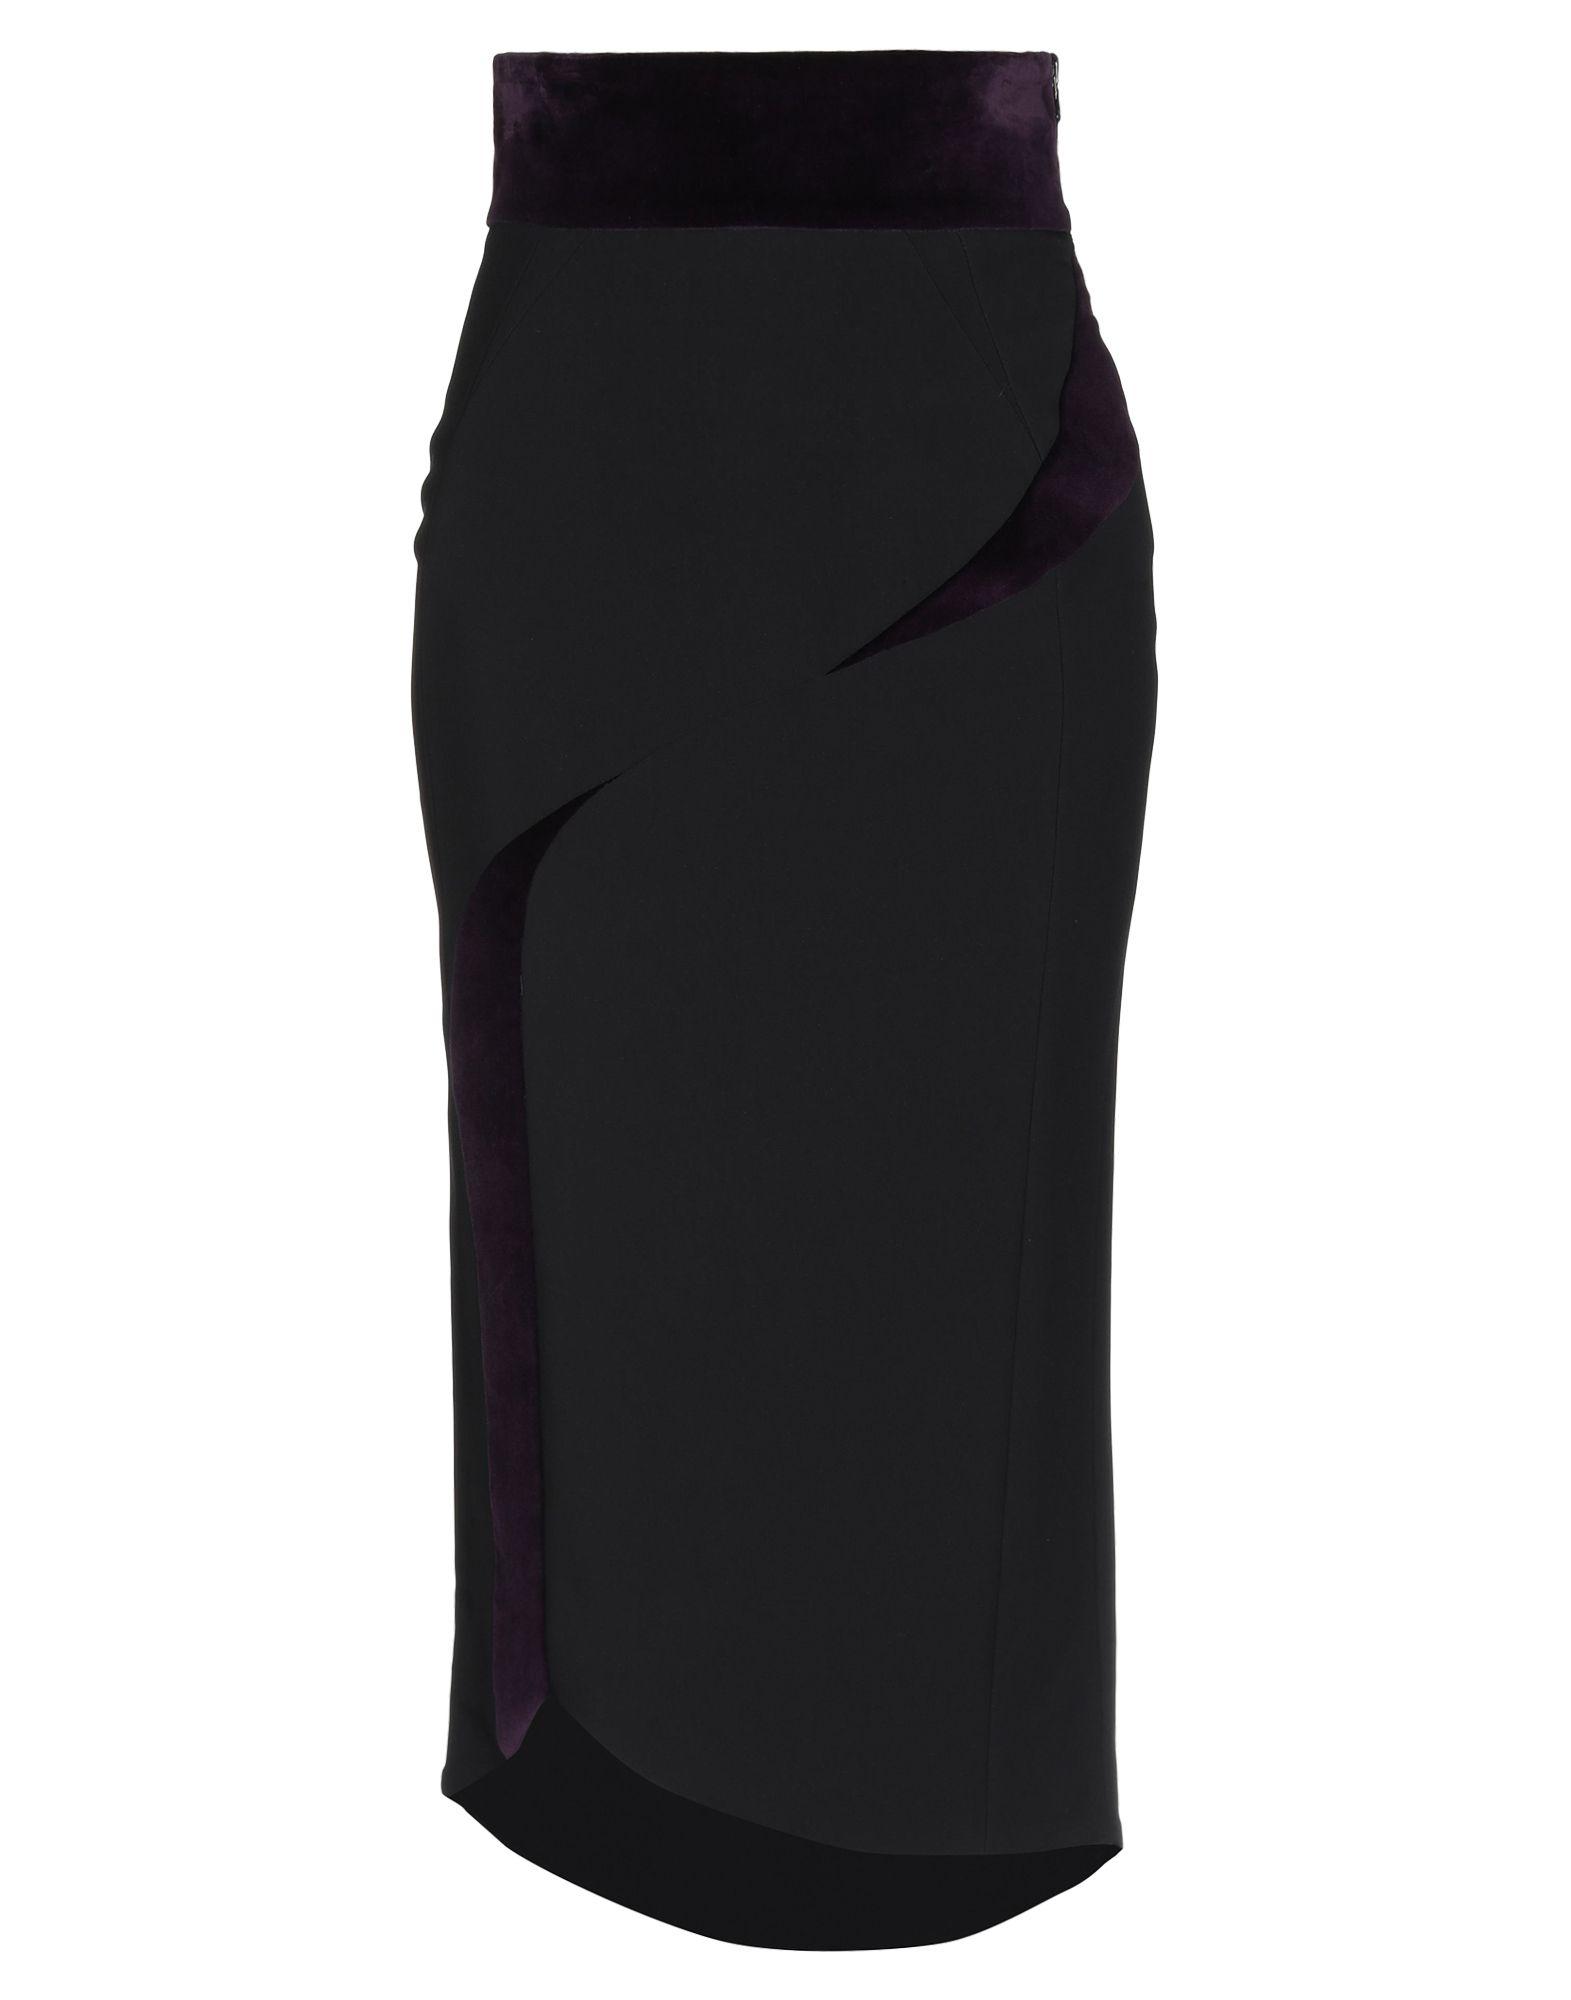 Gonna Longuette Longuette Antonio Berardi donna - 35415607SK  Qualität garantiert